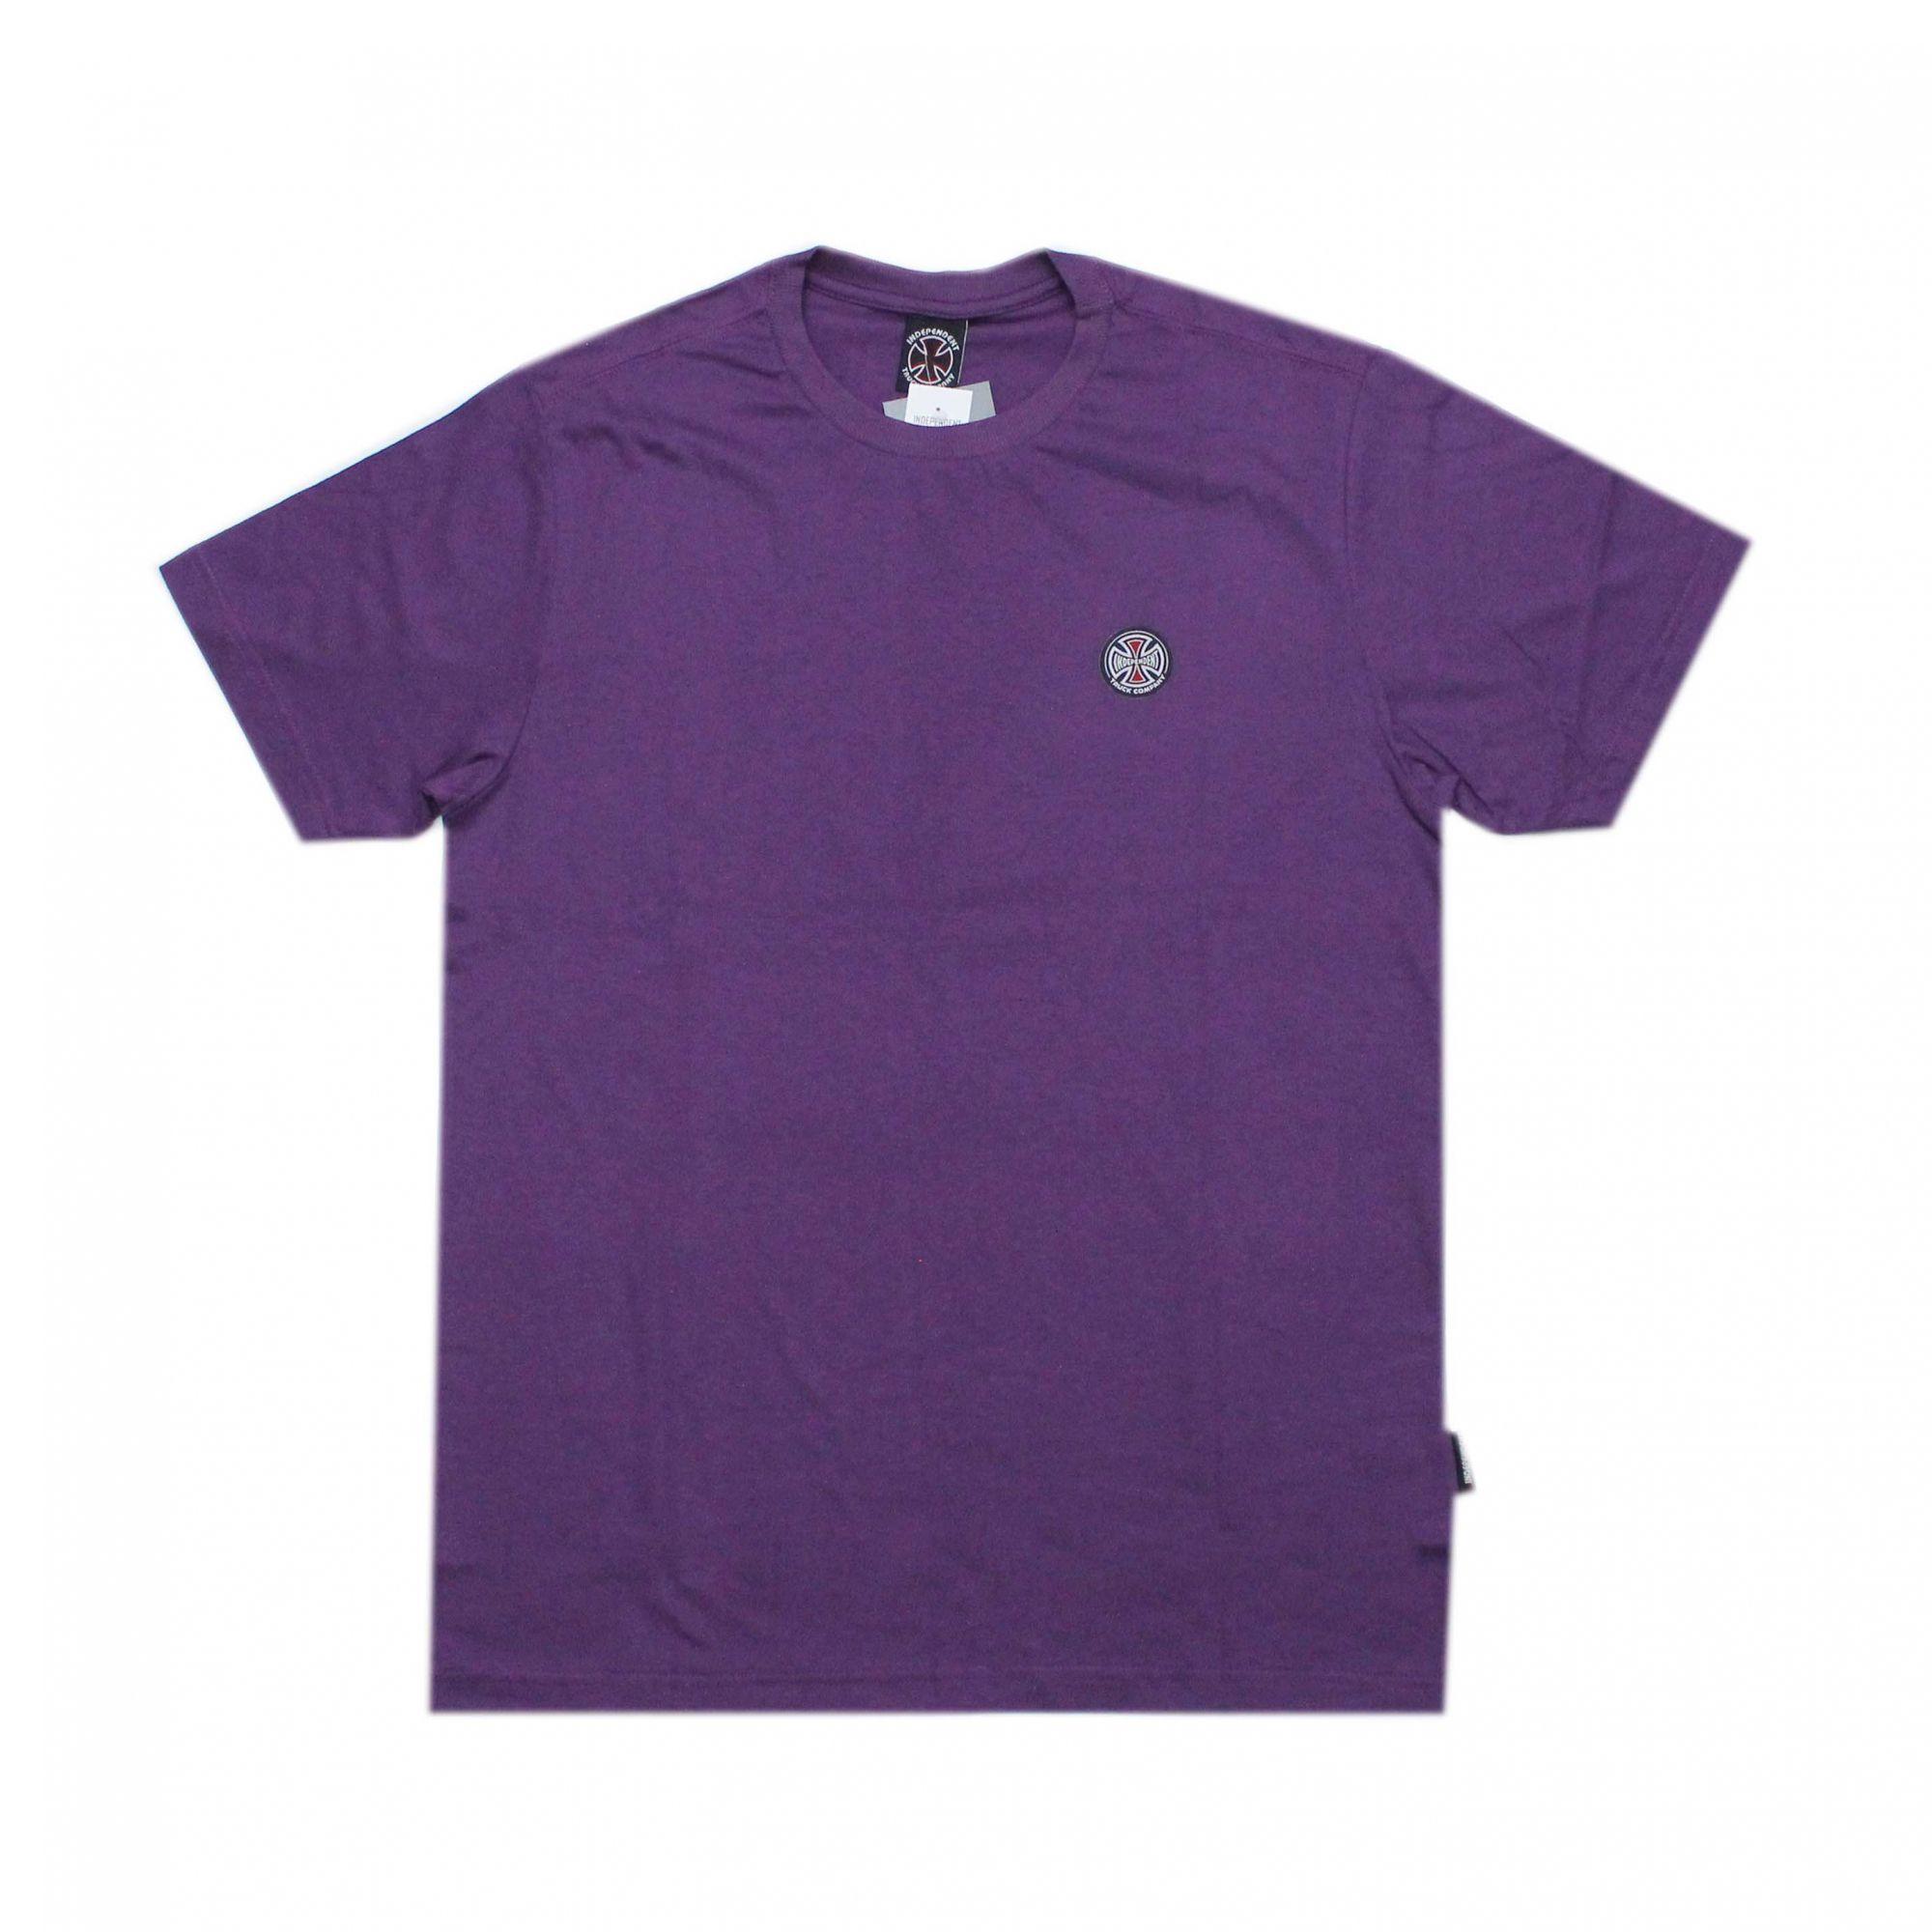 Camiseta Independent Truck Co 3 Colores F/C Roxo